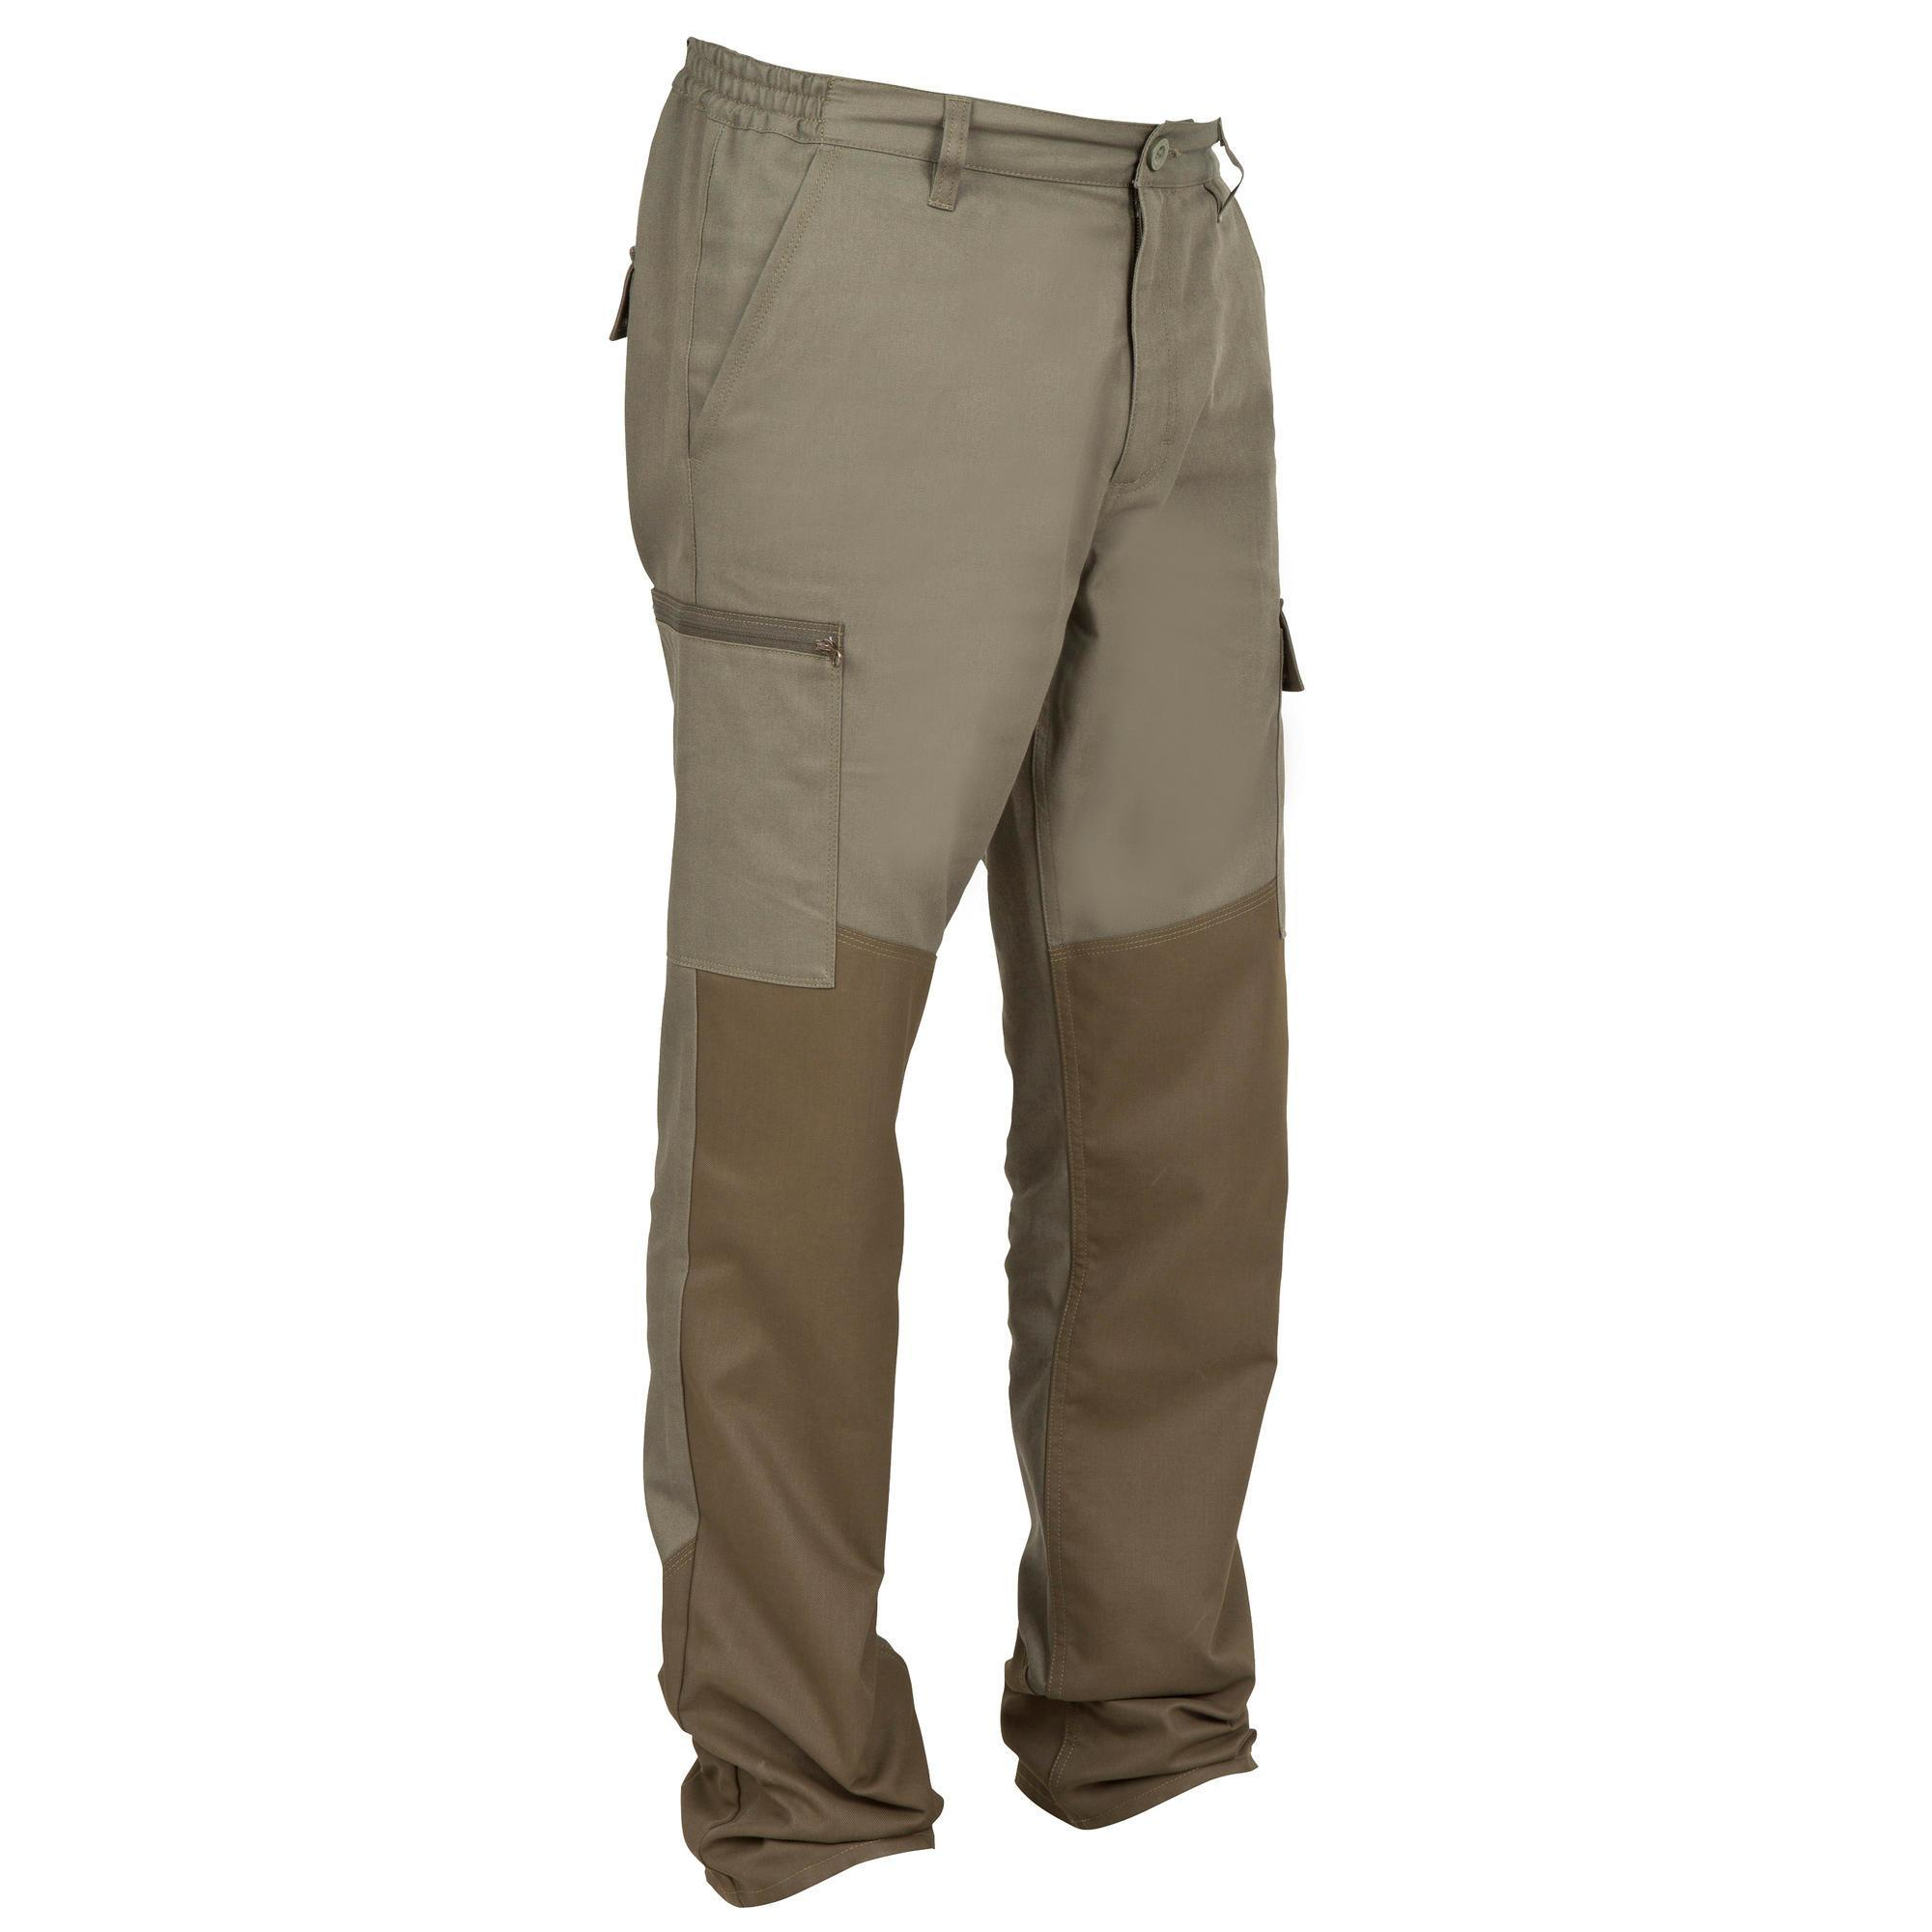 Jagdhose 100 verstärkt | Sportbekleidung > Sporthosen > Trekkinghosen | Solognac